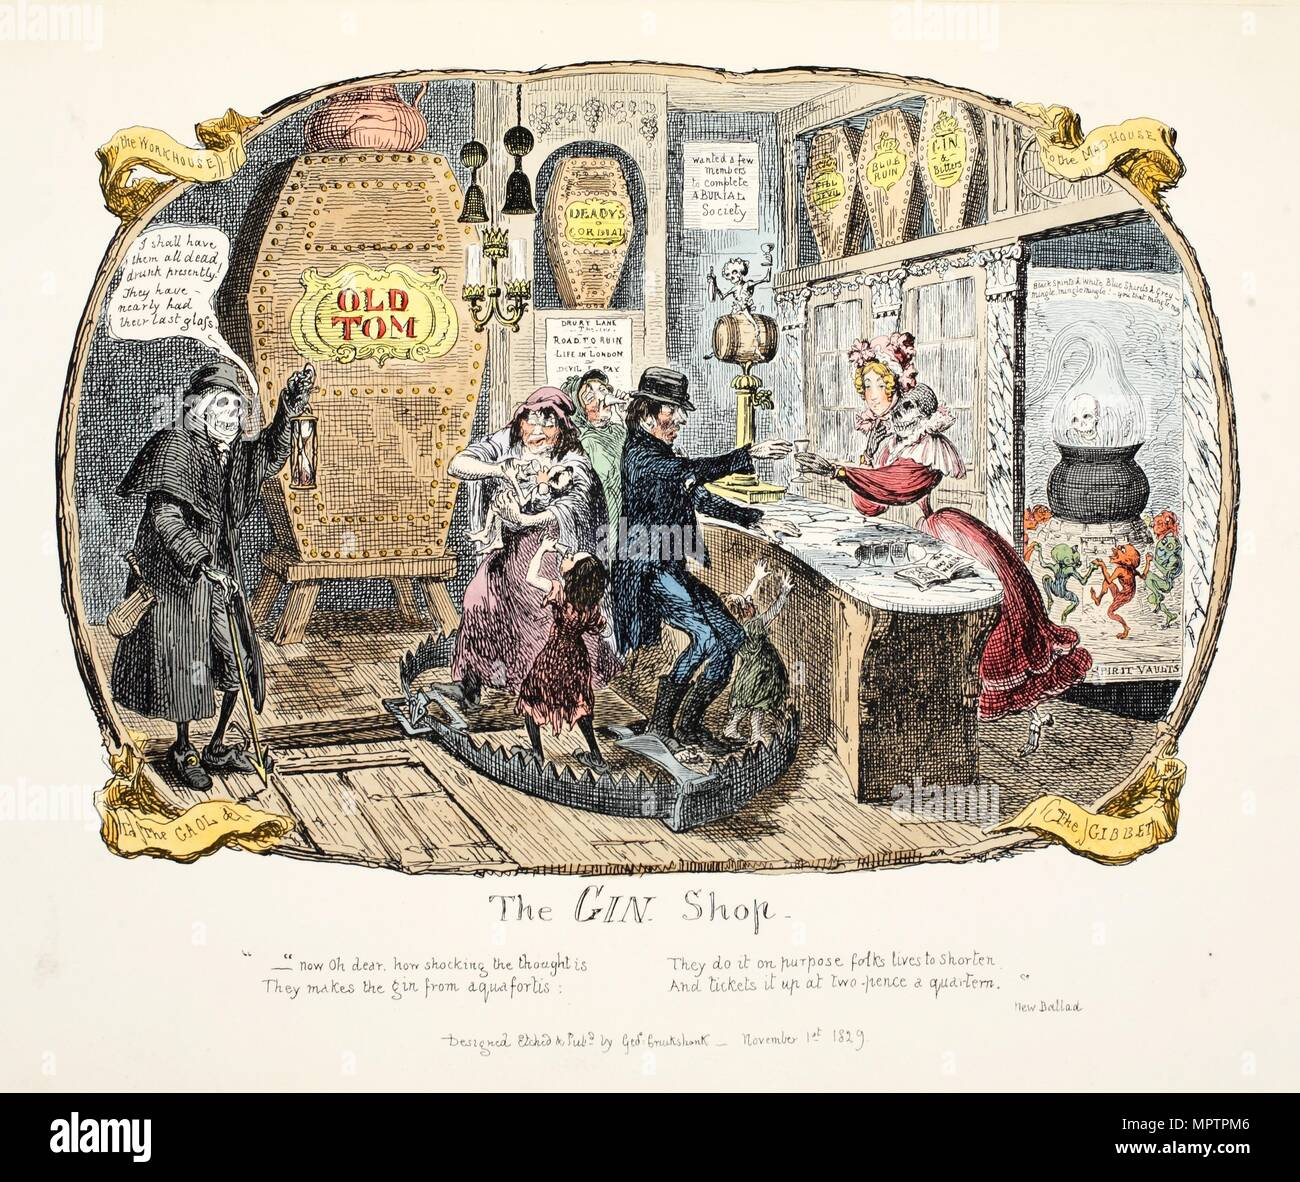 The Gin Shop, 1829.